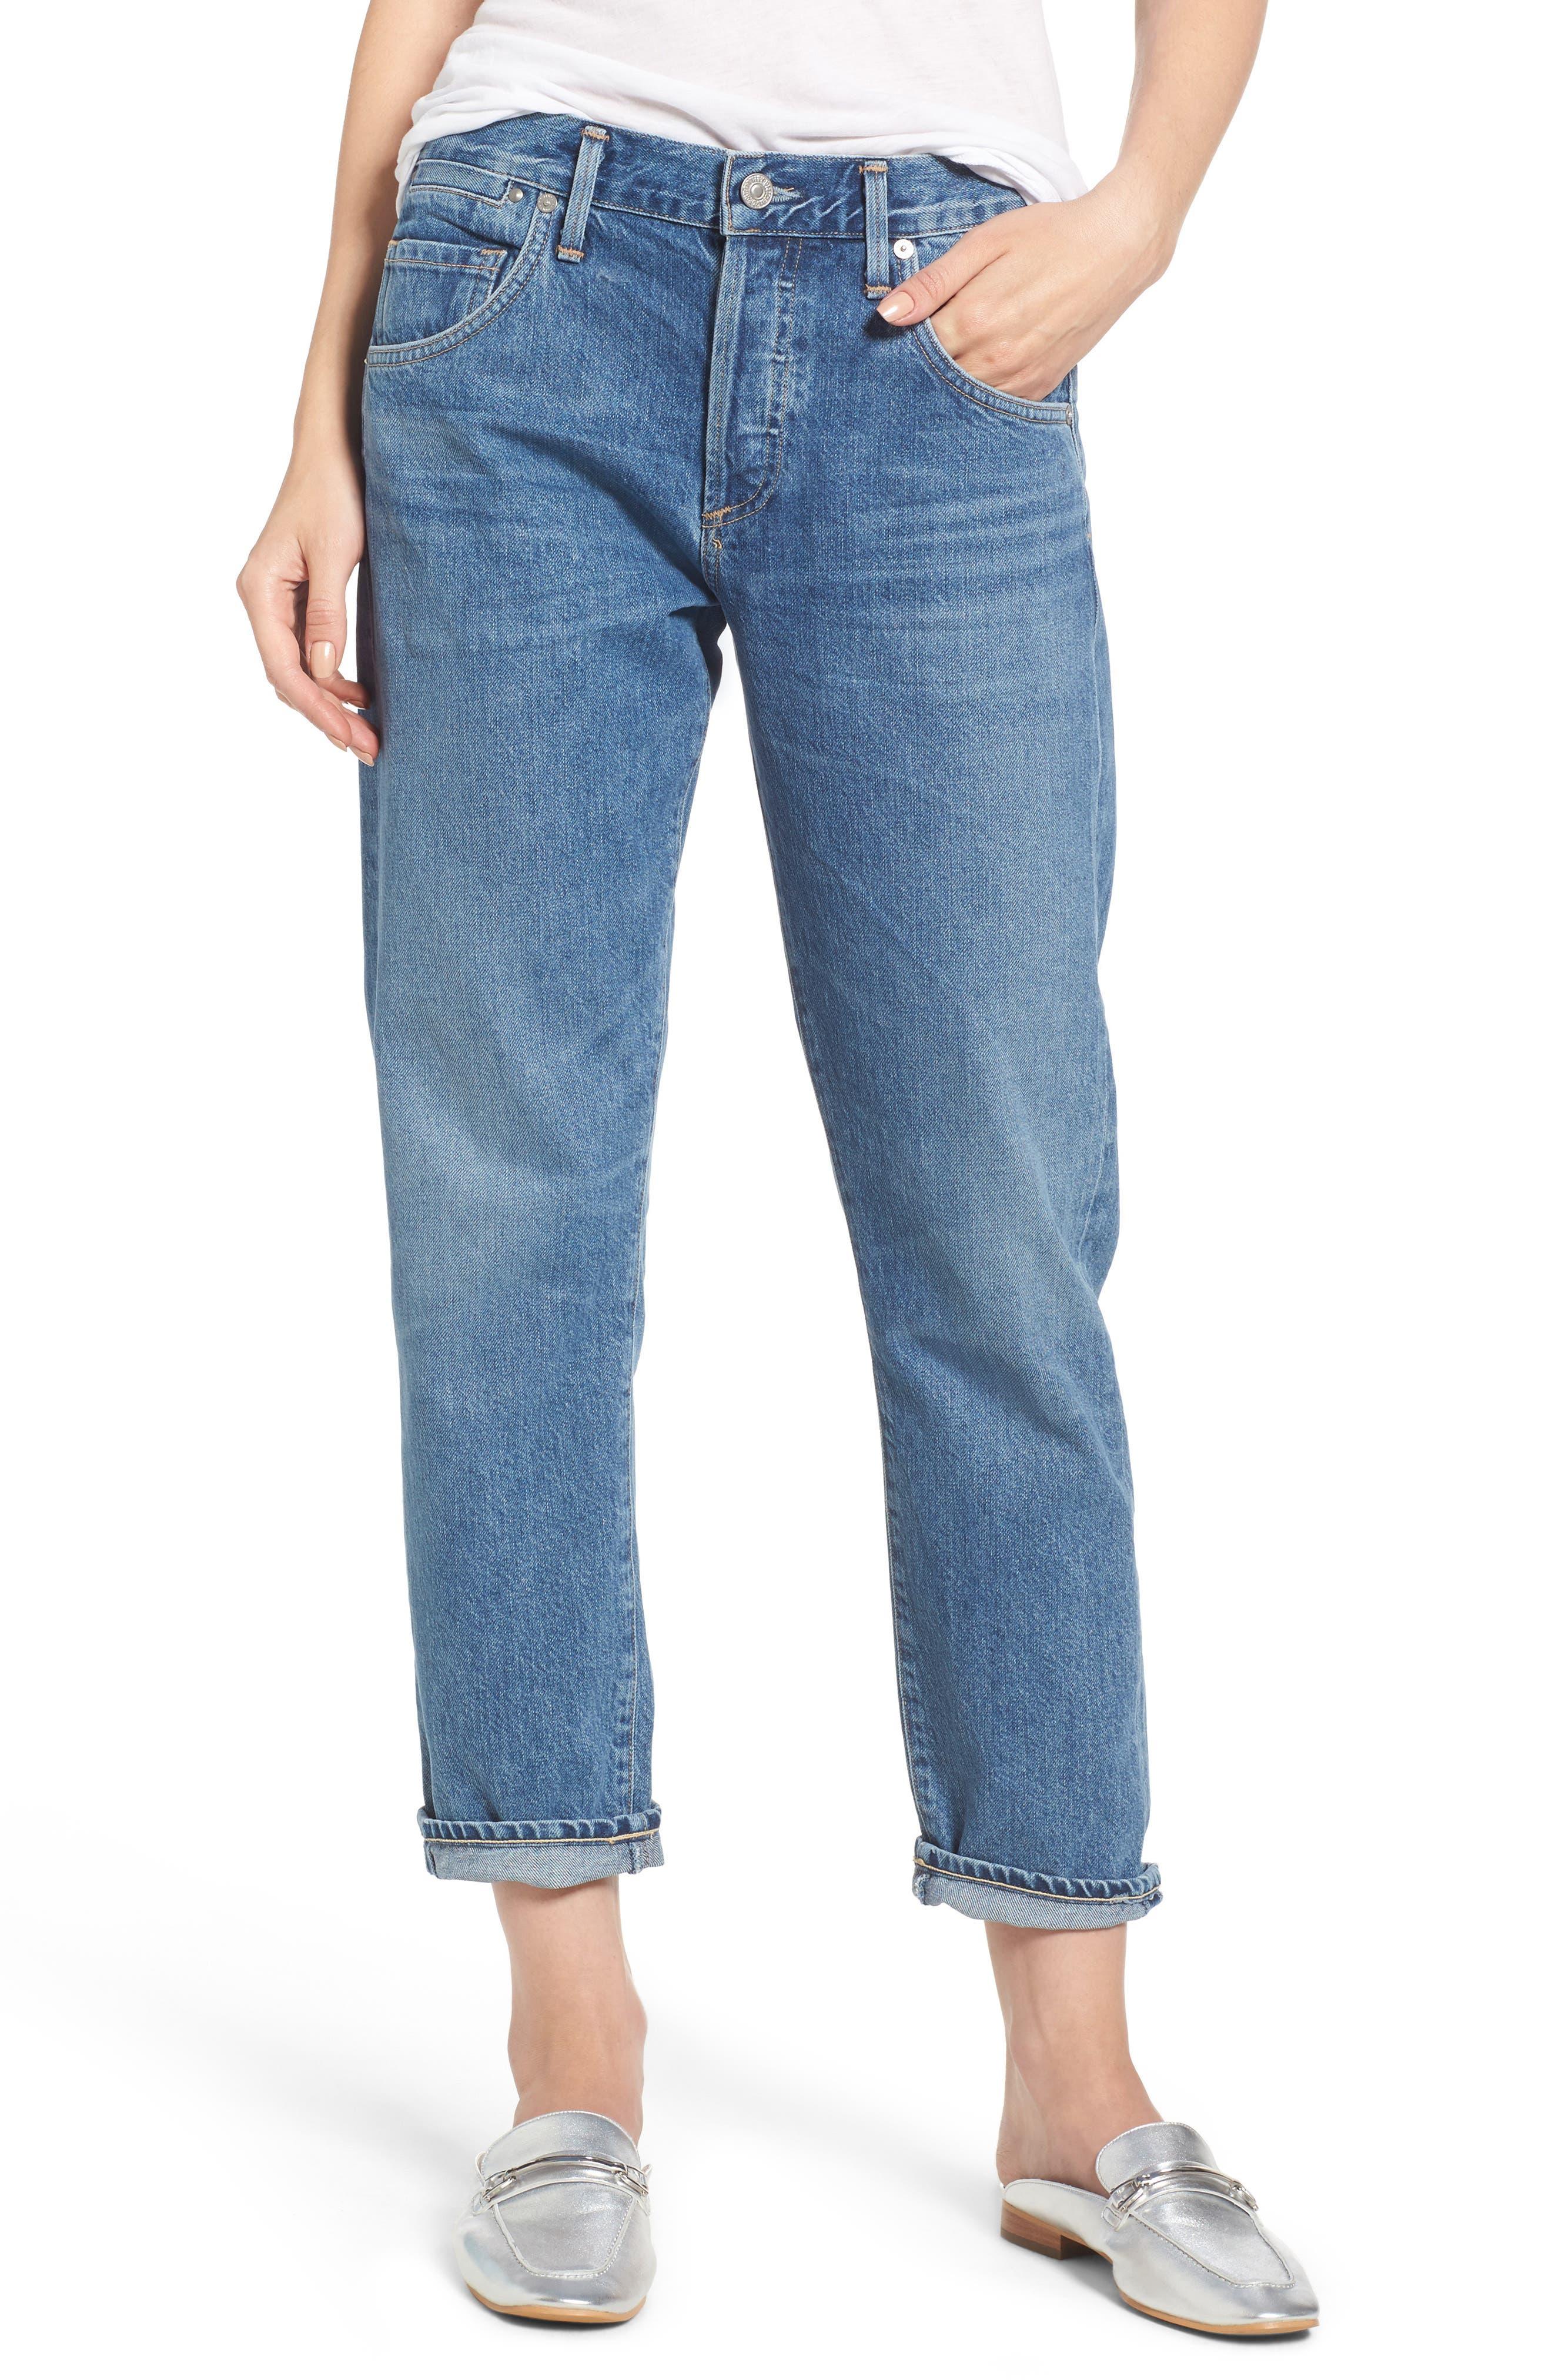 Citizens of Humanity Emerson Slim Boyfriend Jeans (Dream On)